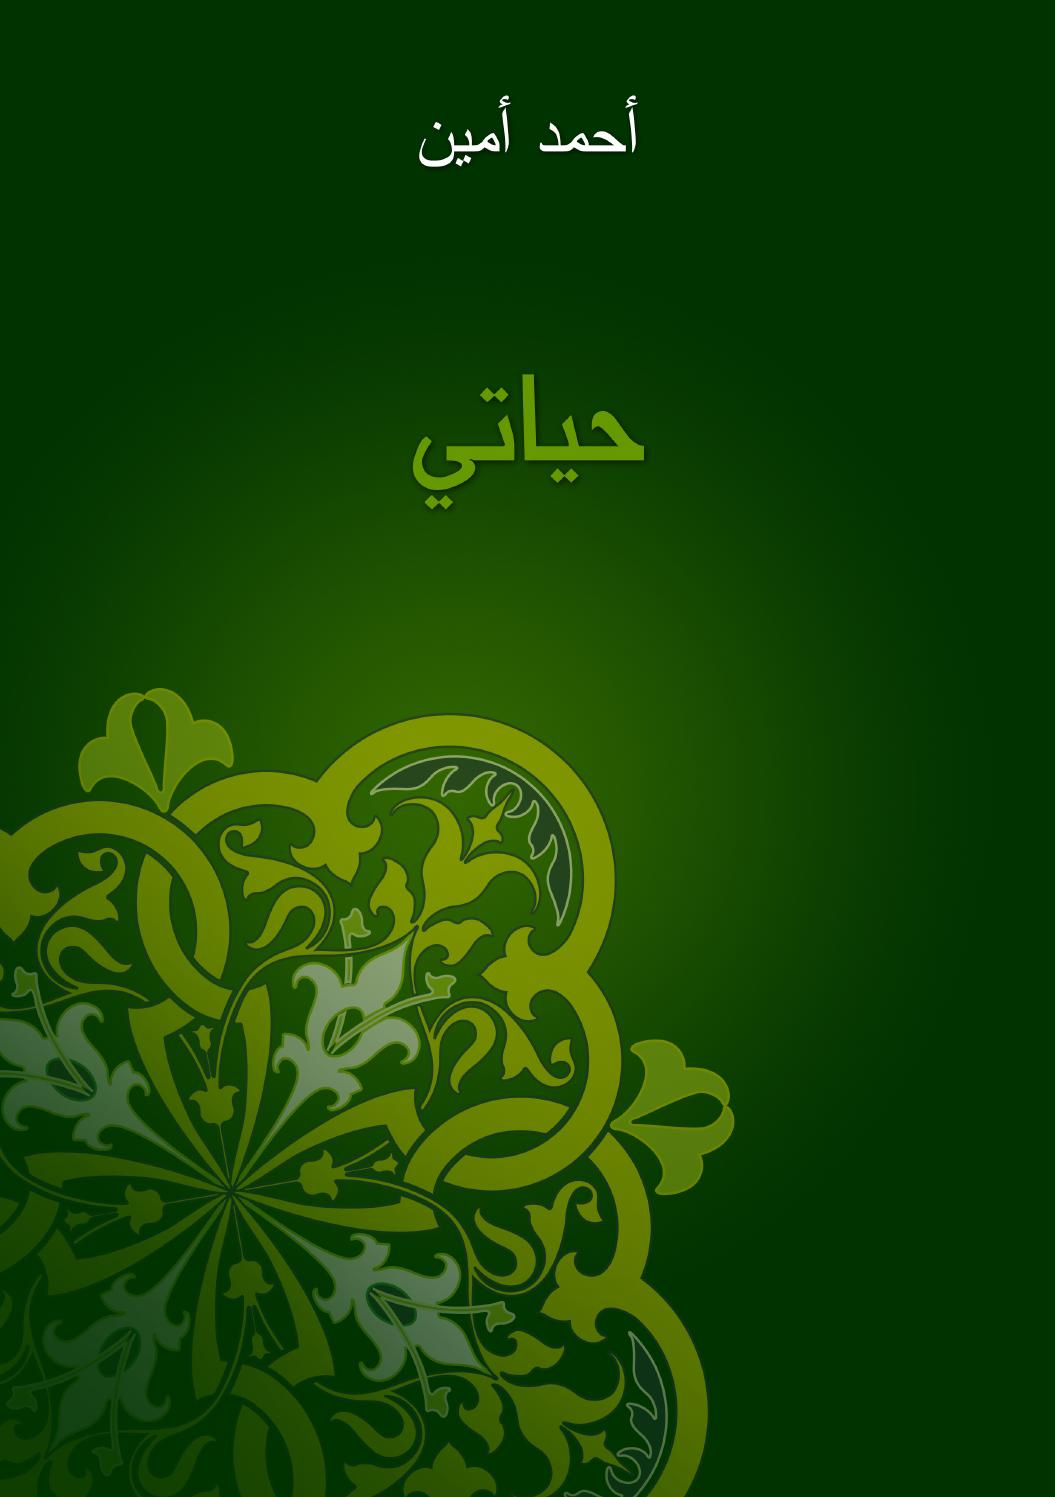 794aebe0d حياتي أحمد أمين (1) by amar26680 - issuu